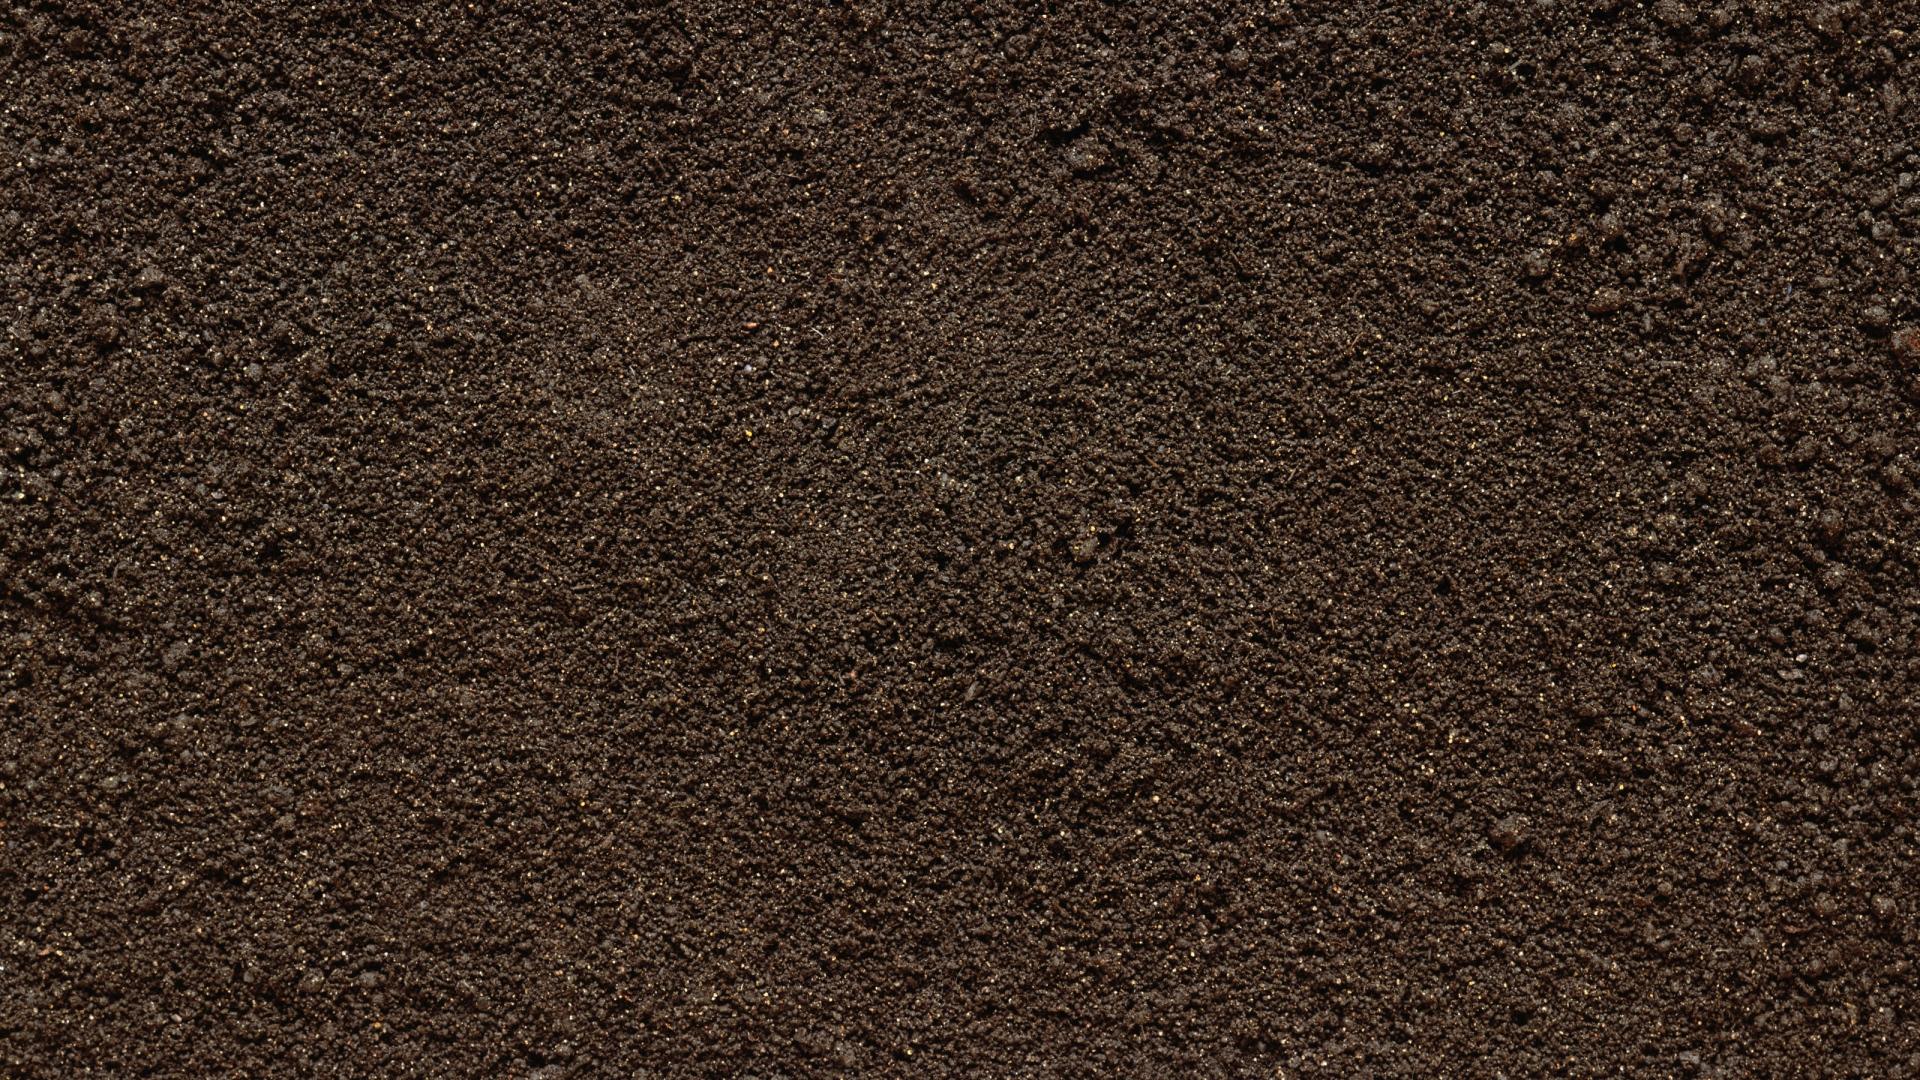 download wallpaper 1920x1080 surface, dirt, stones, texture full hd